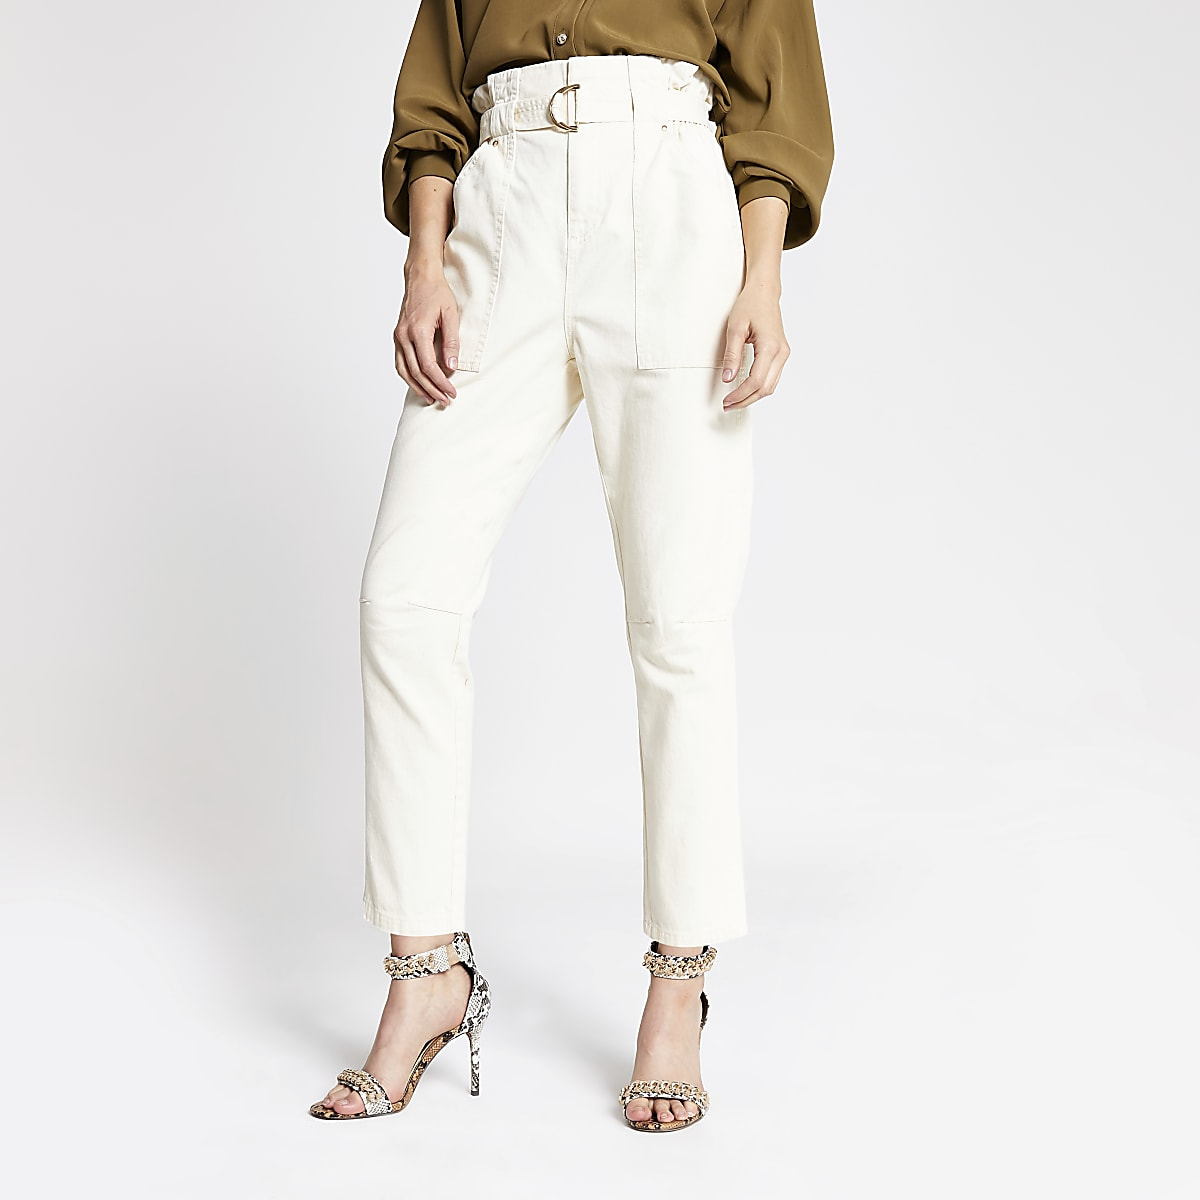 Cream paperbag trousers